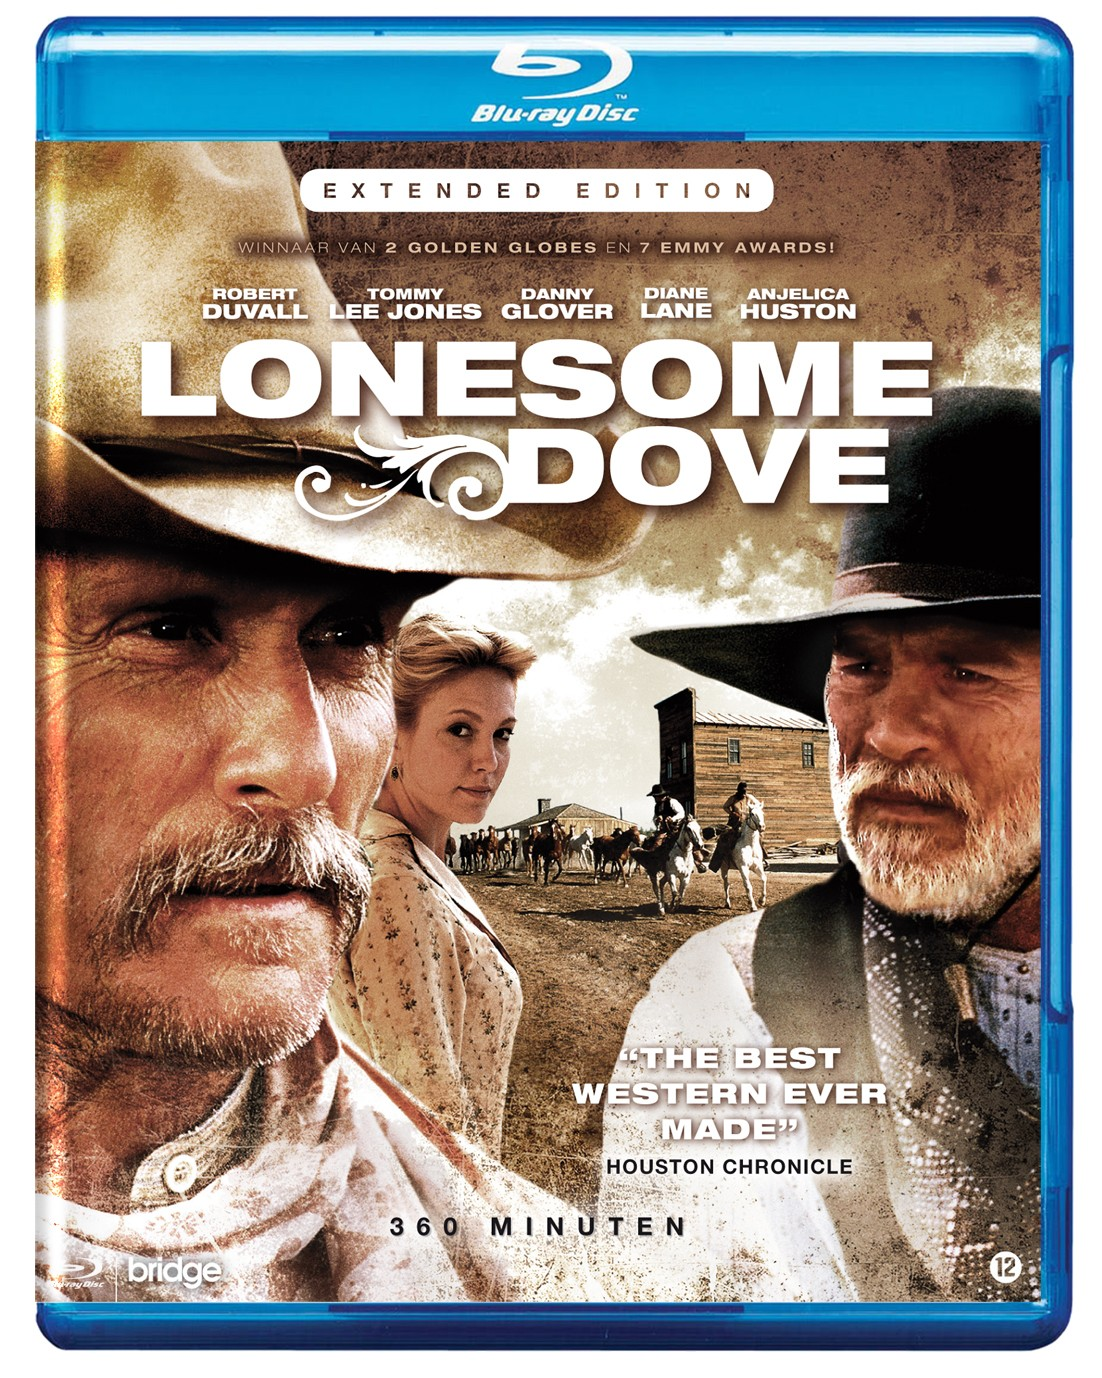 Koji film ste poslednji gledali? - Page 15 Lonesome_dove-bd_2d